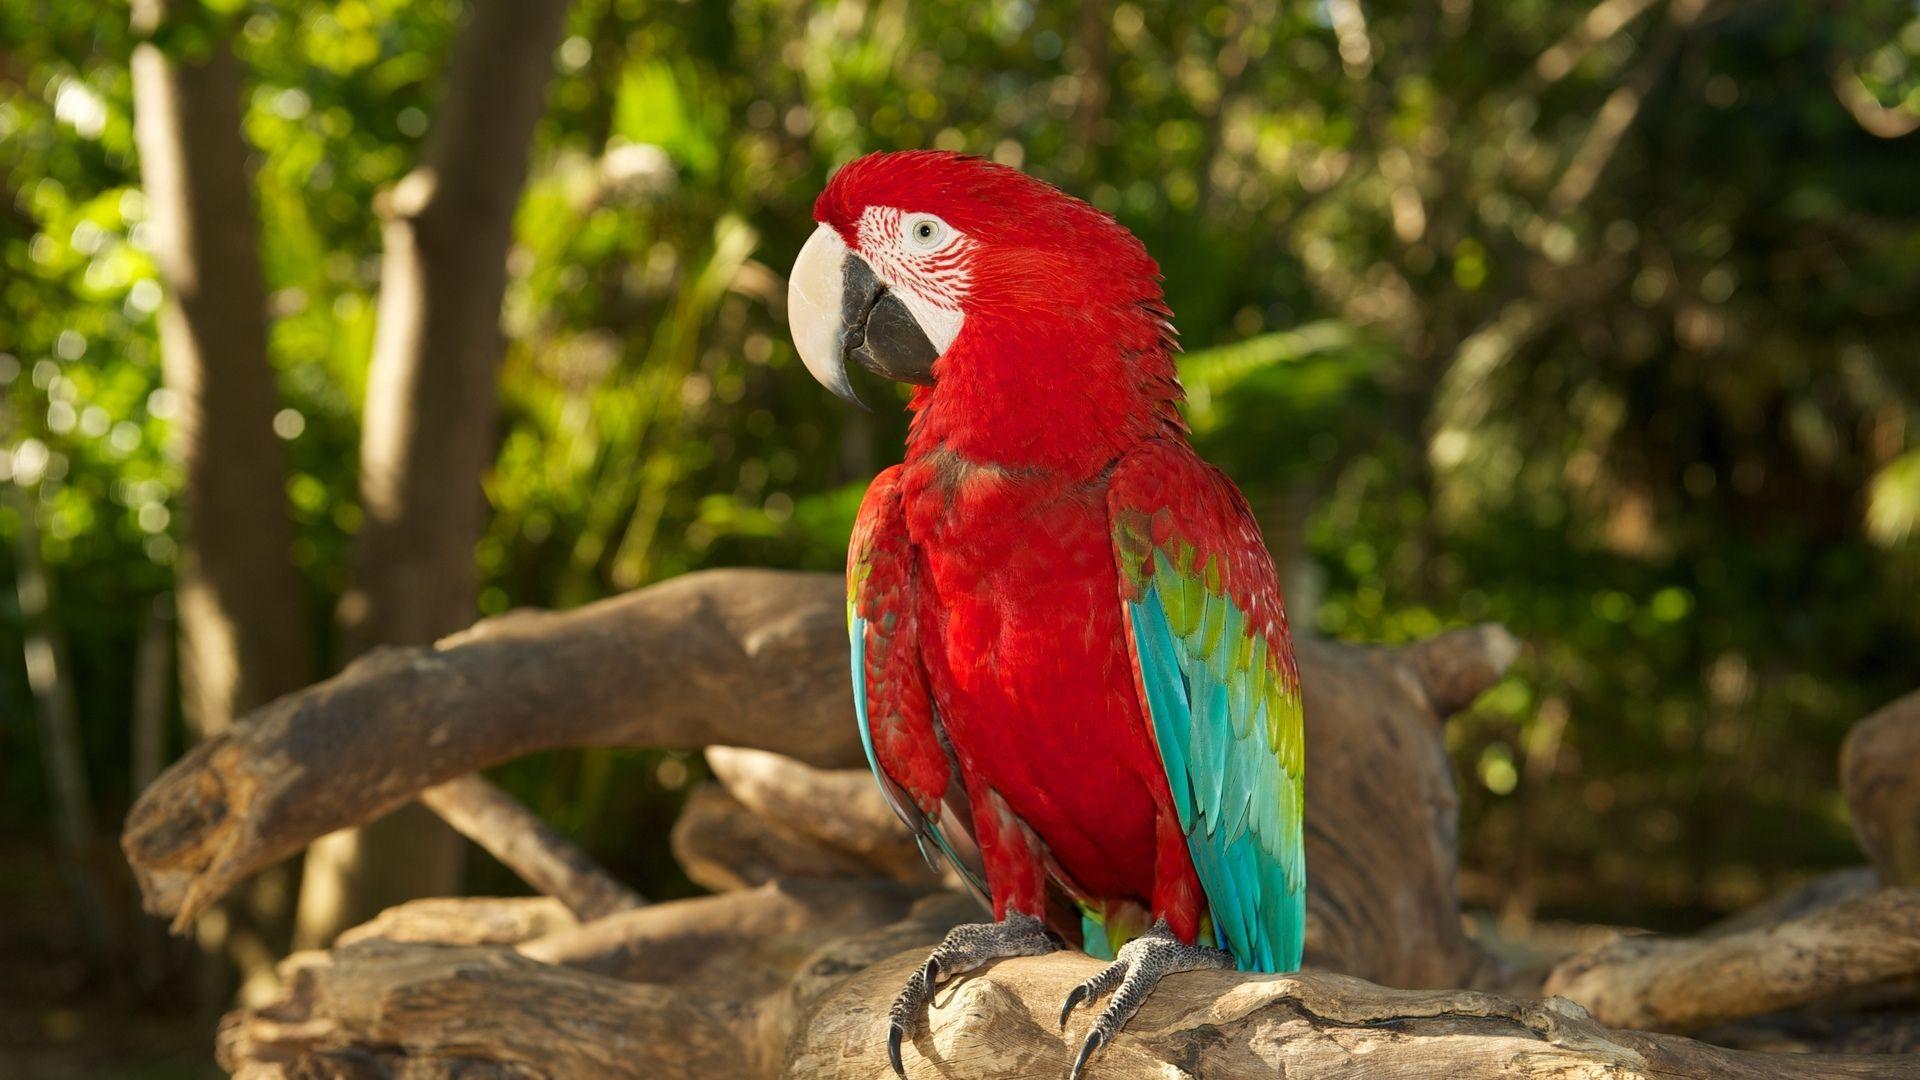 Rainbow Lorikeet Macaw Red